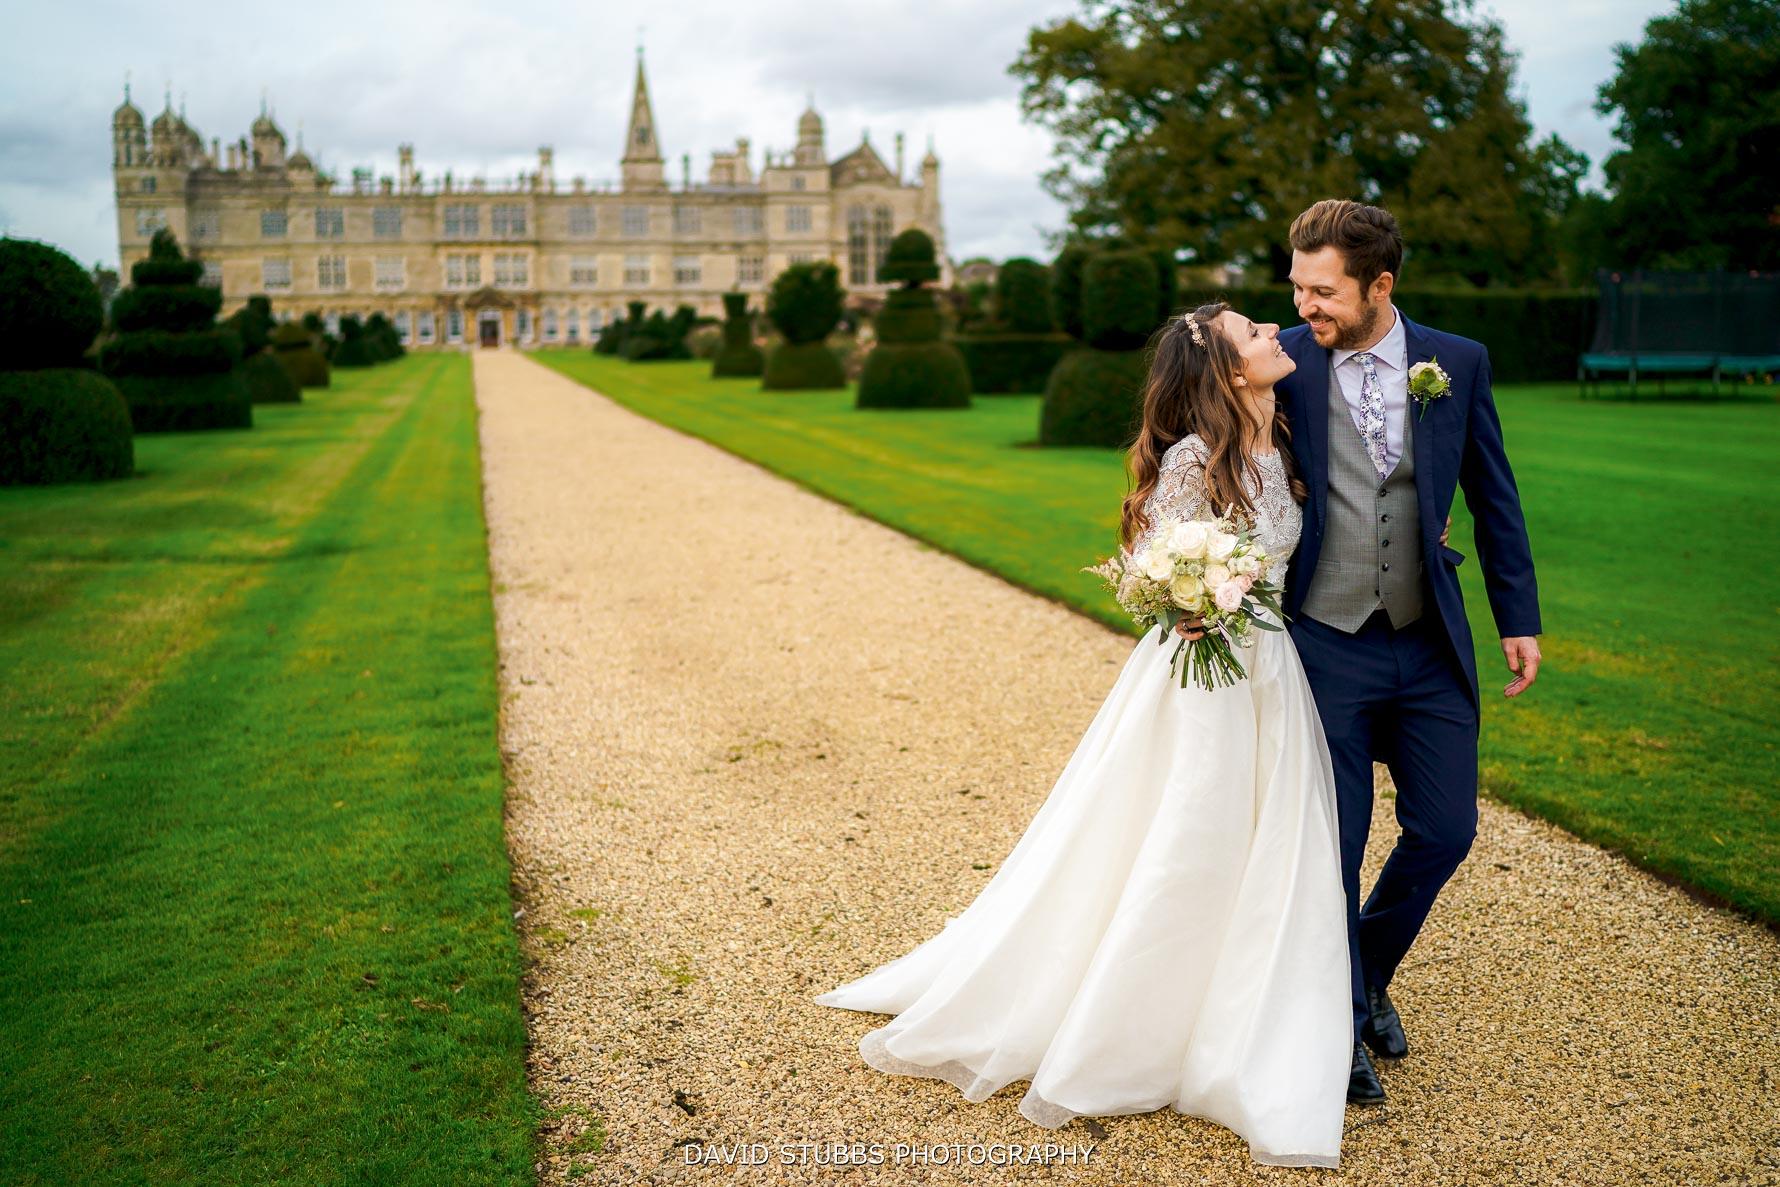 burghley house wedding photographer